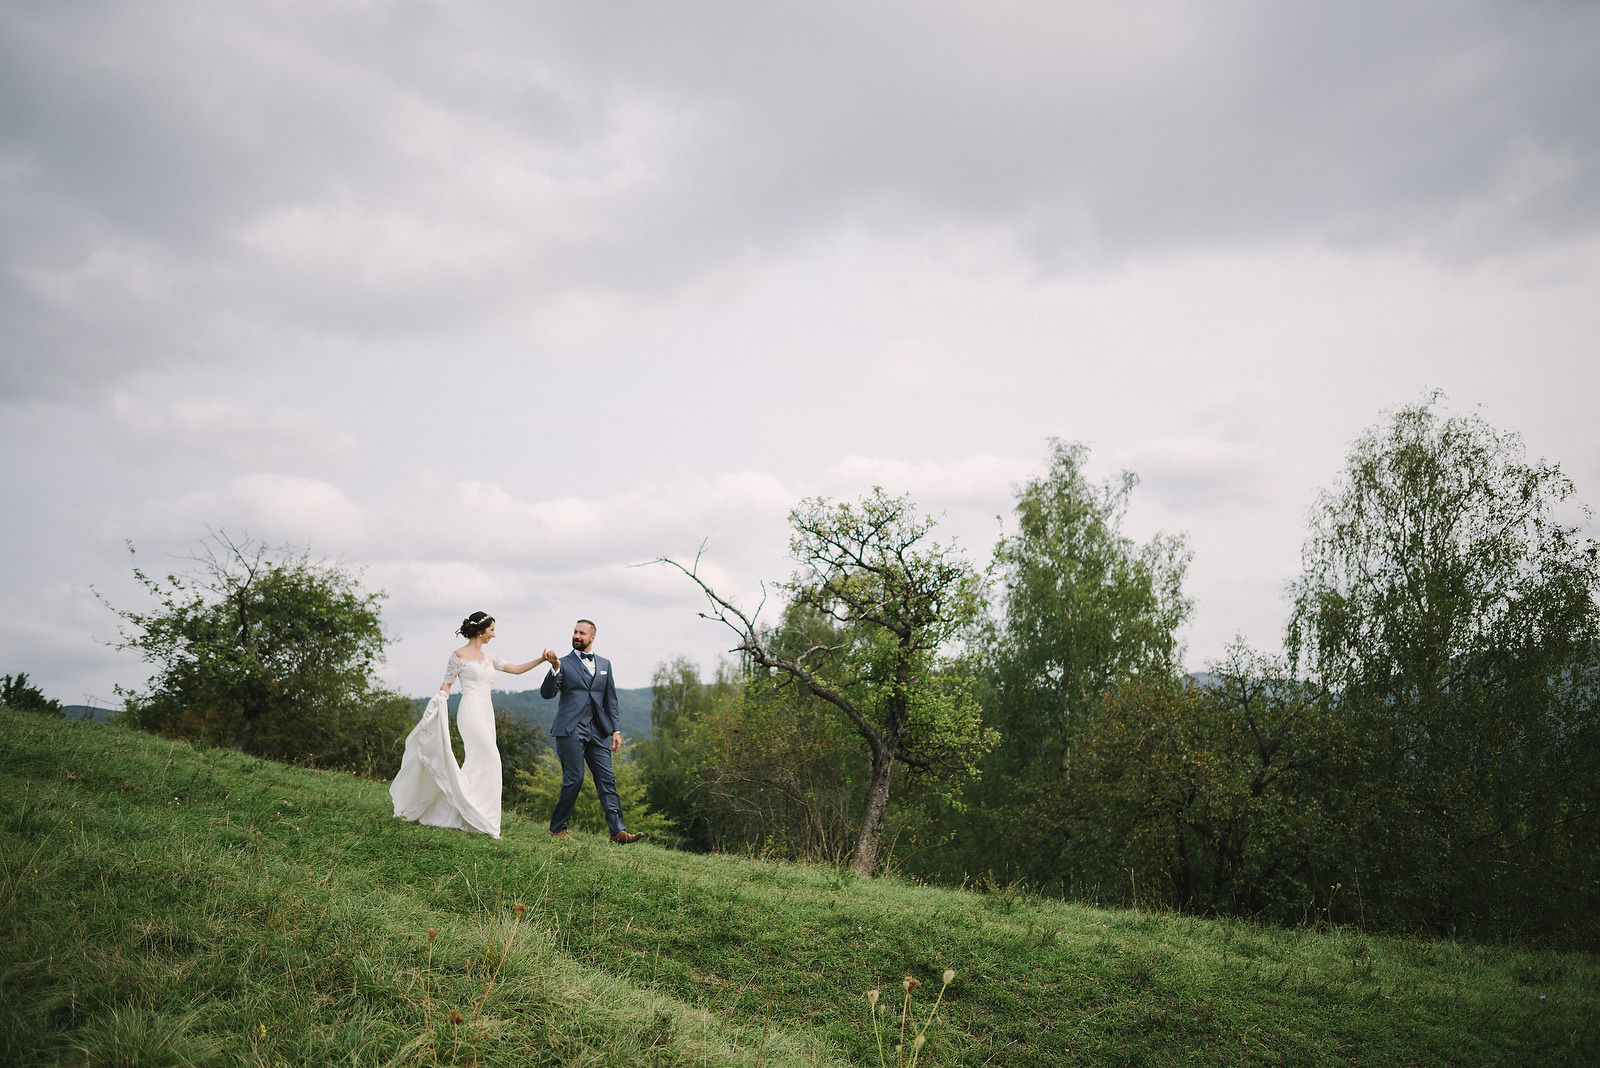 Fotograf Konstanz - Hochzeitsfotograf Reutlingen Achalm Hochzeit EFP 30 - Als Hochzeitsfotograf auf der Achalm, Reutlingen  - 23 -